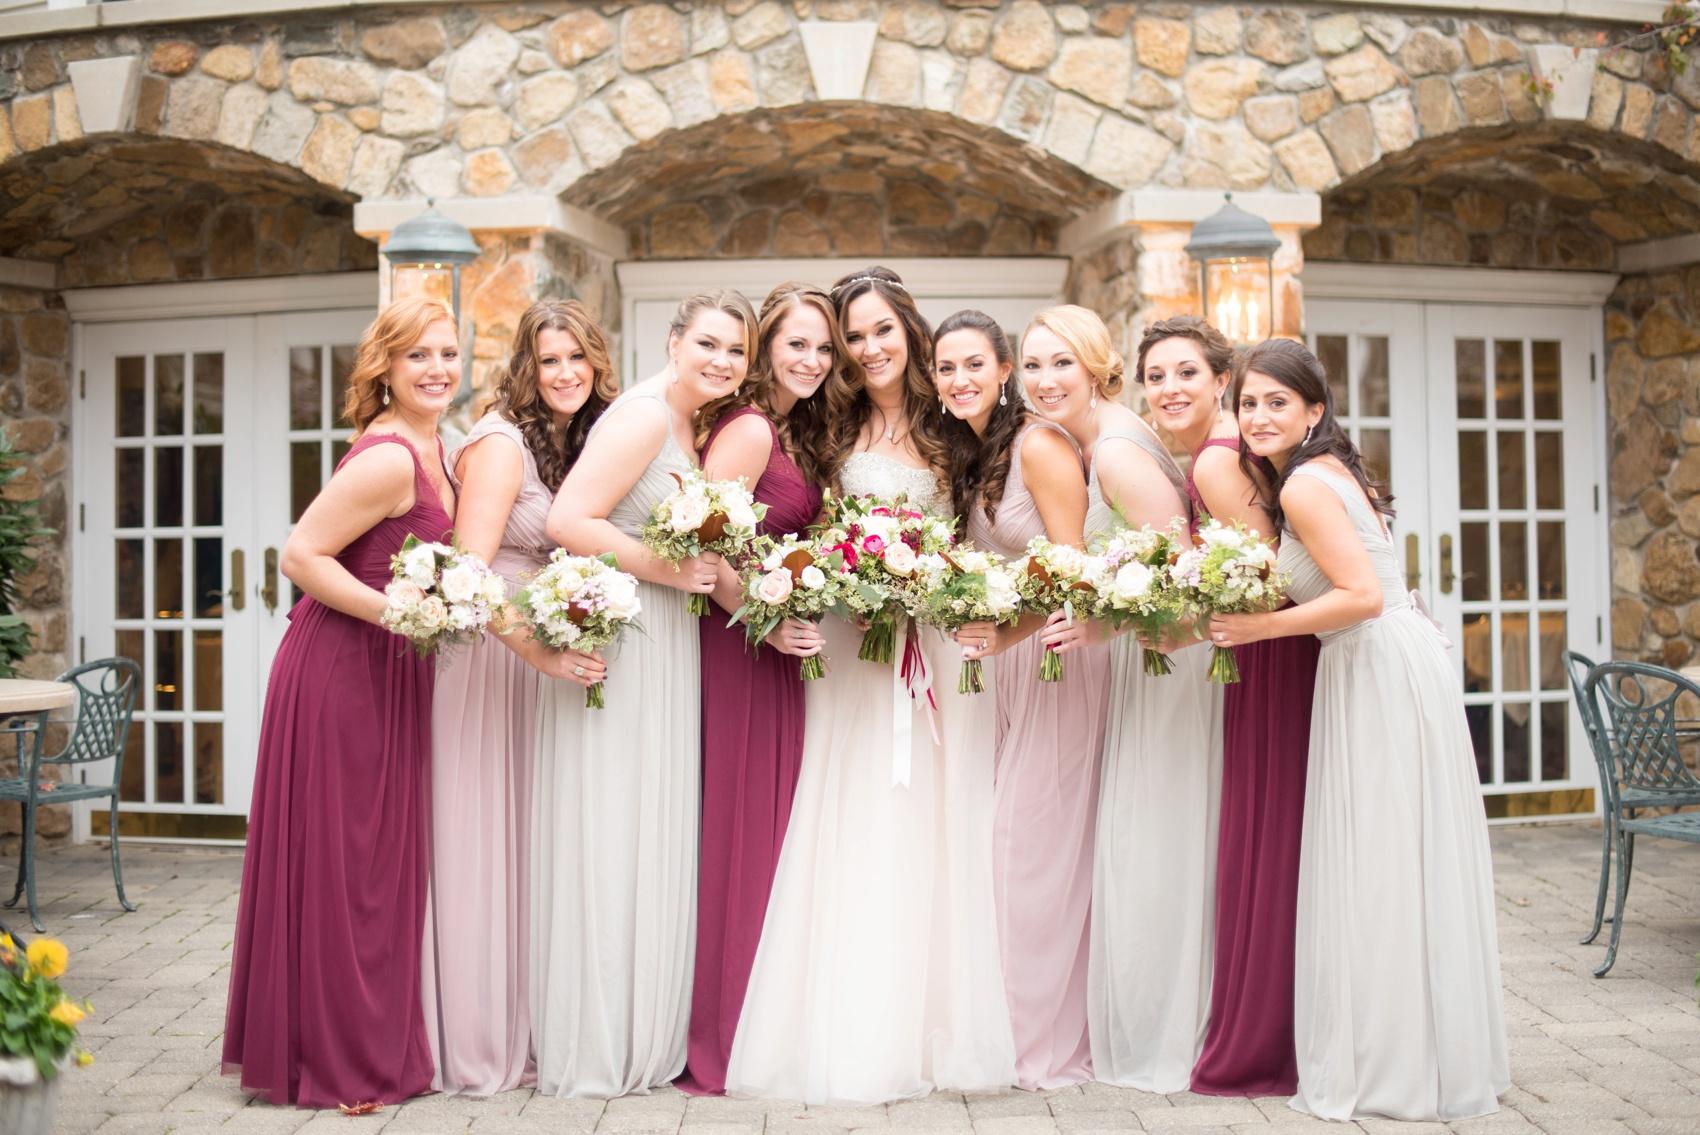 Bridesmaid Dress Trends In 2017